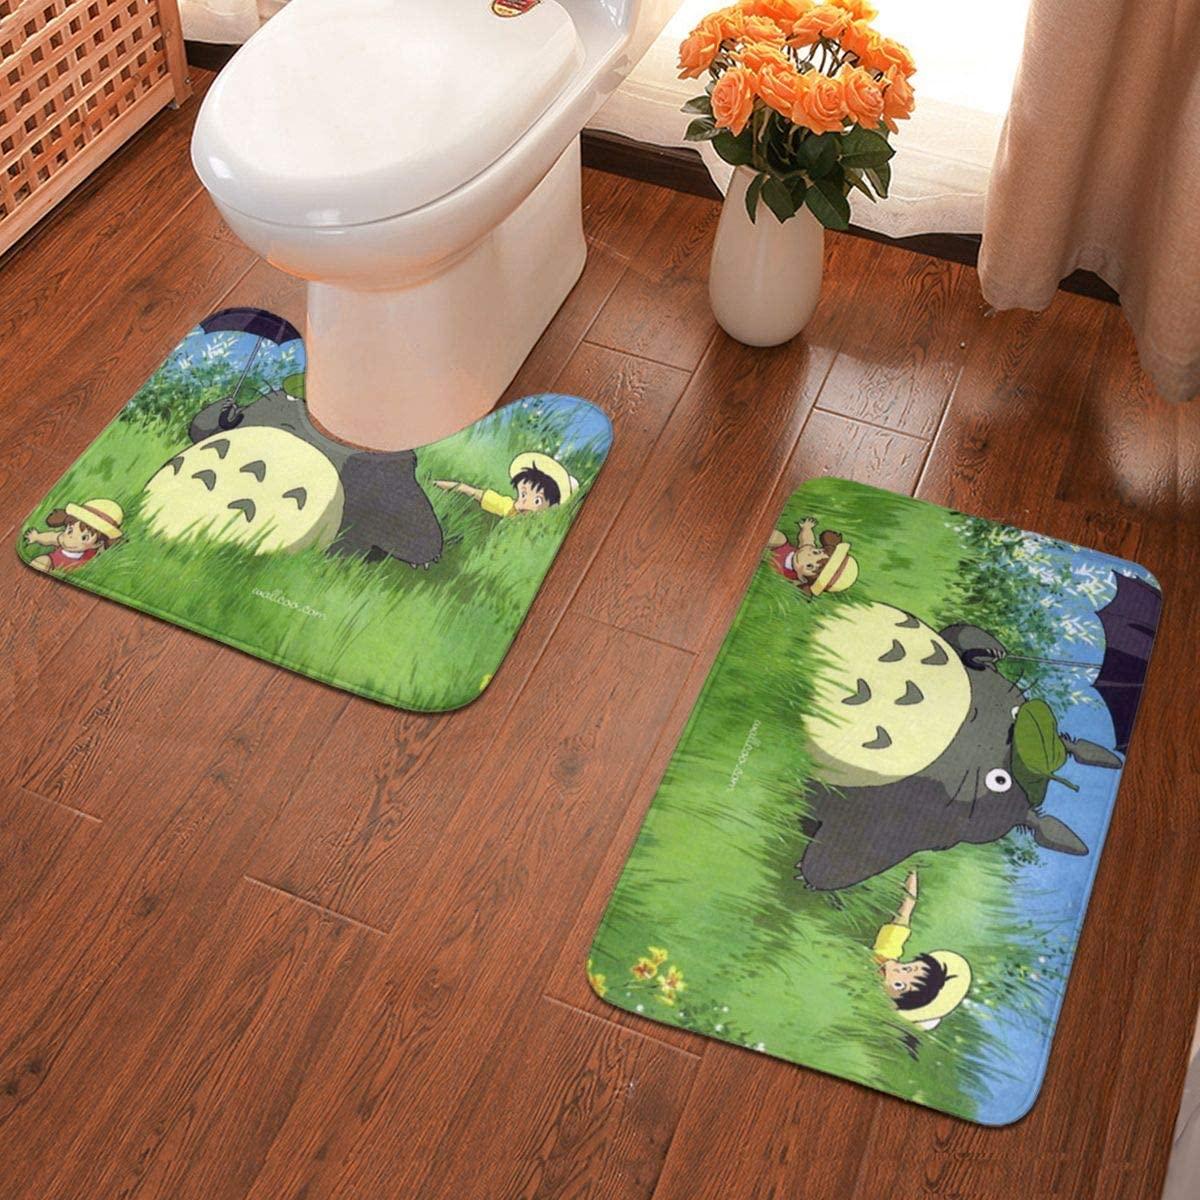 Ghibli,My Neighbor Totoro Bathroom Rug Mats Set 2 Piece Anti-Skid Pads Bath Mat